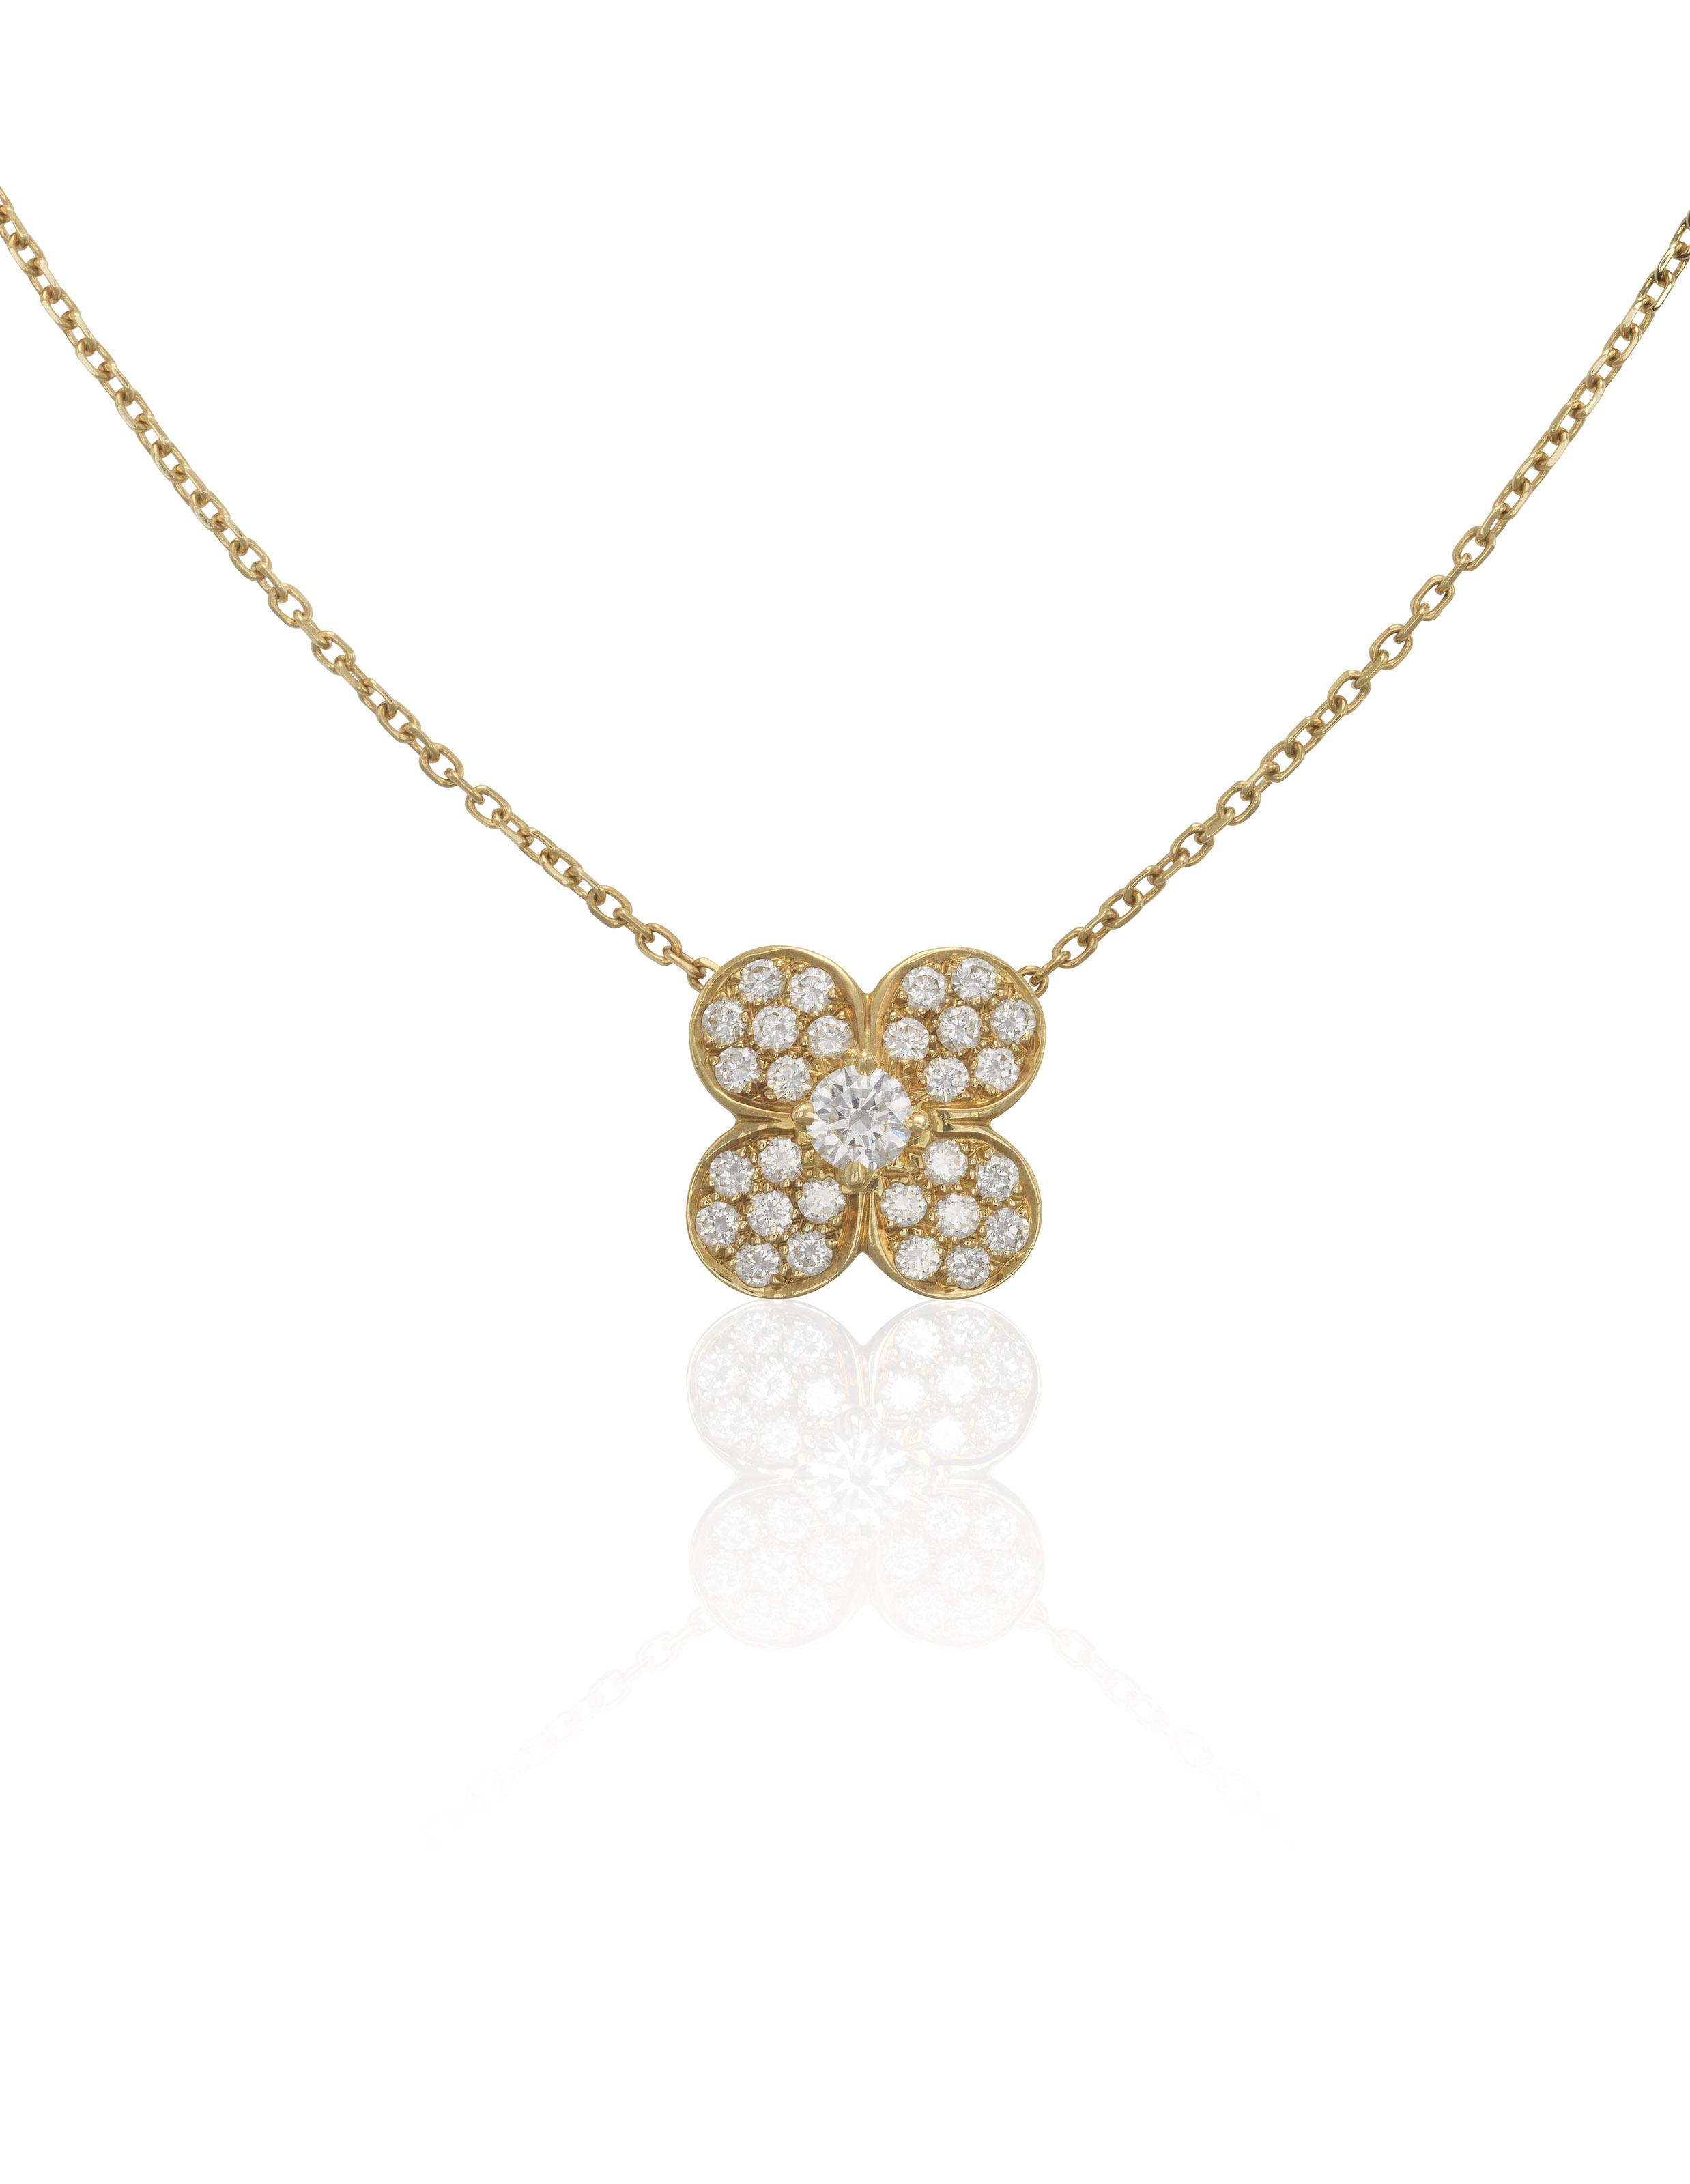 Van cleef arpels trfle diamond set pendant necklace christies van cleef arpels trfle diamond set pendant necklace aloadofball Image collections